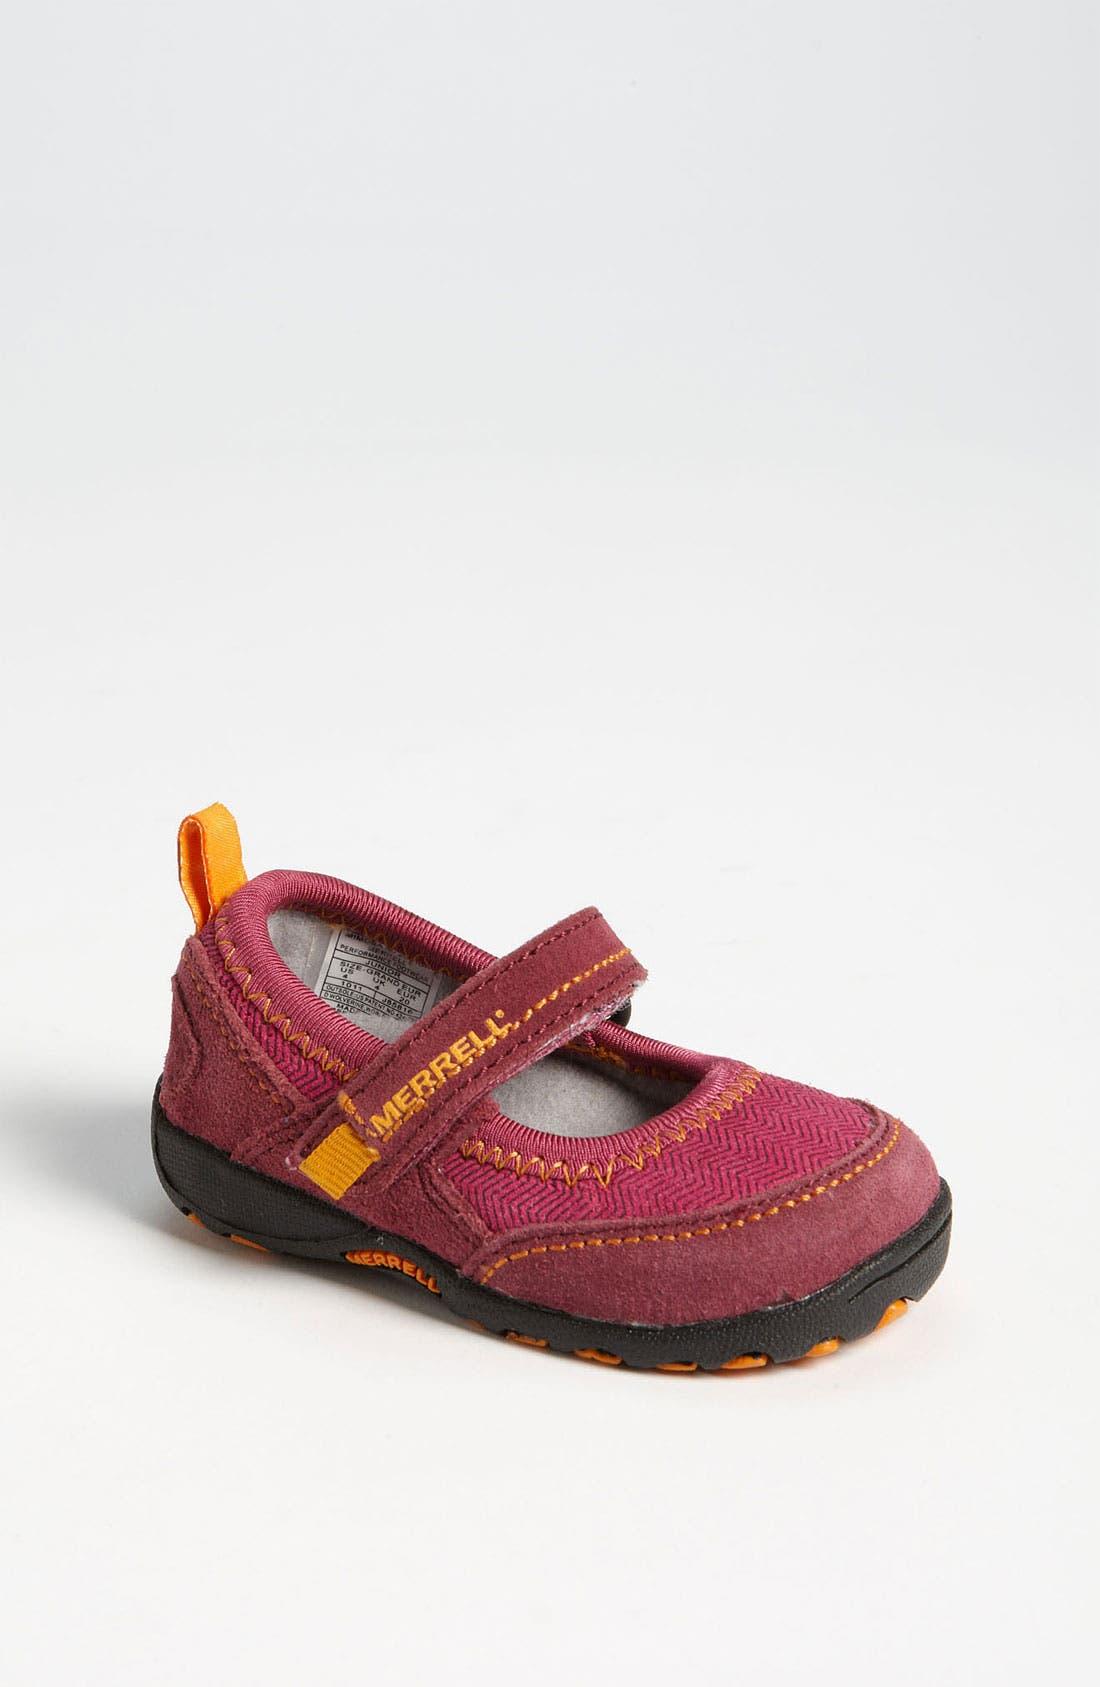 Alternate Image 1 Selected - Merrell 'Mimosa' Mary Jane Sneaker (Baby & Walker)